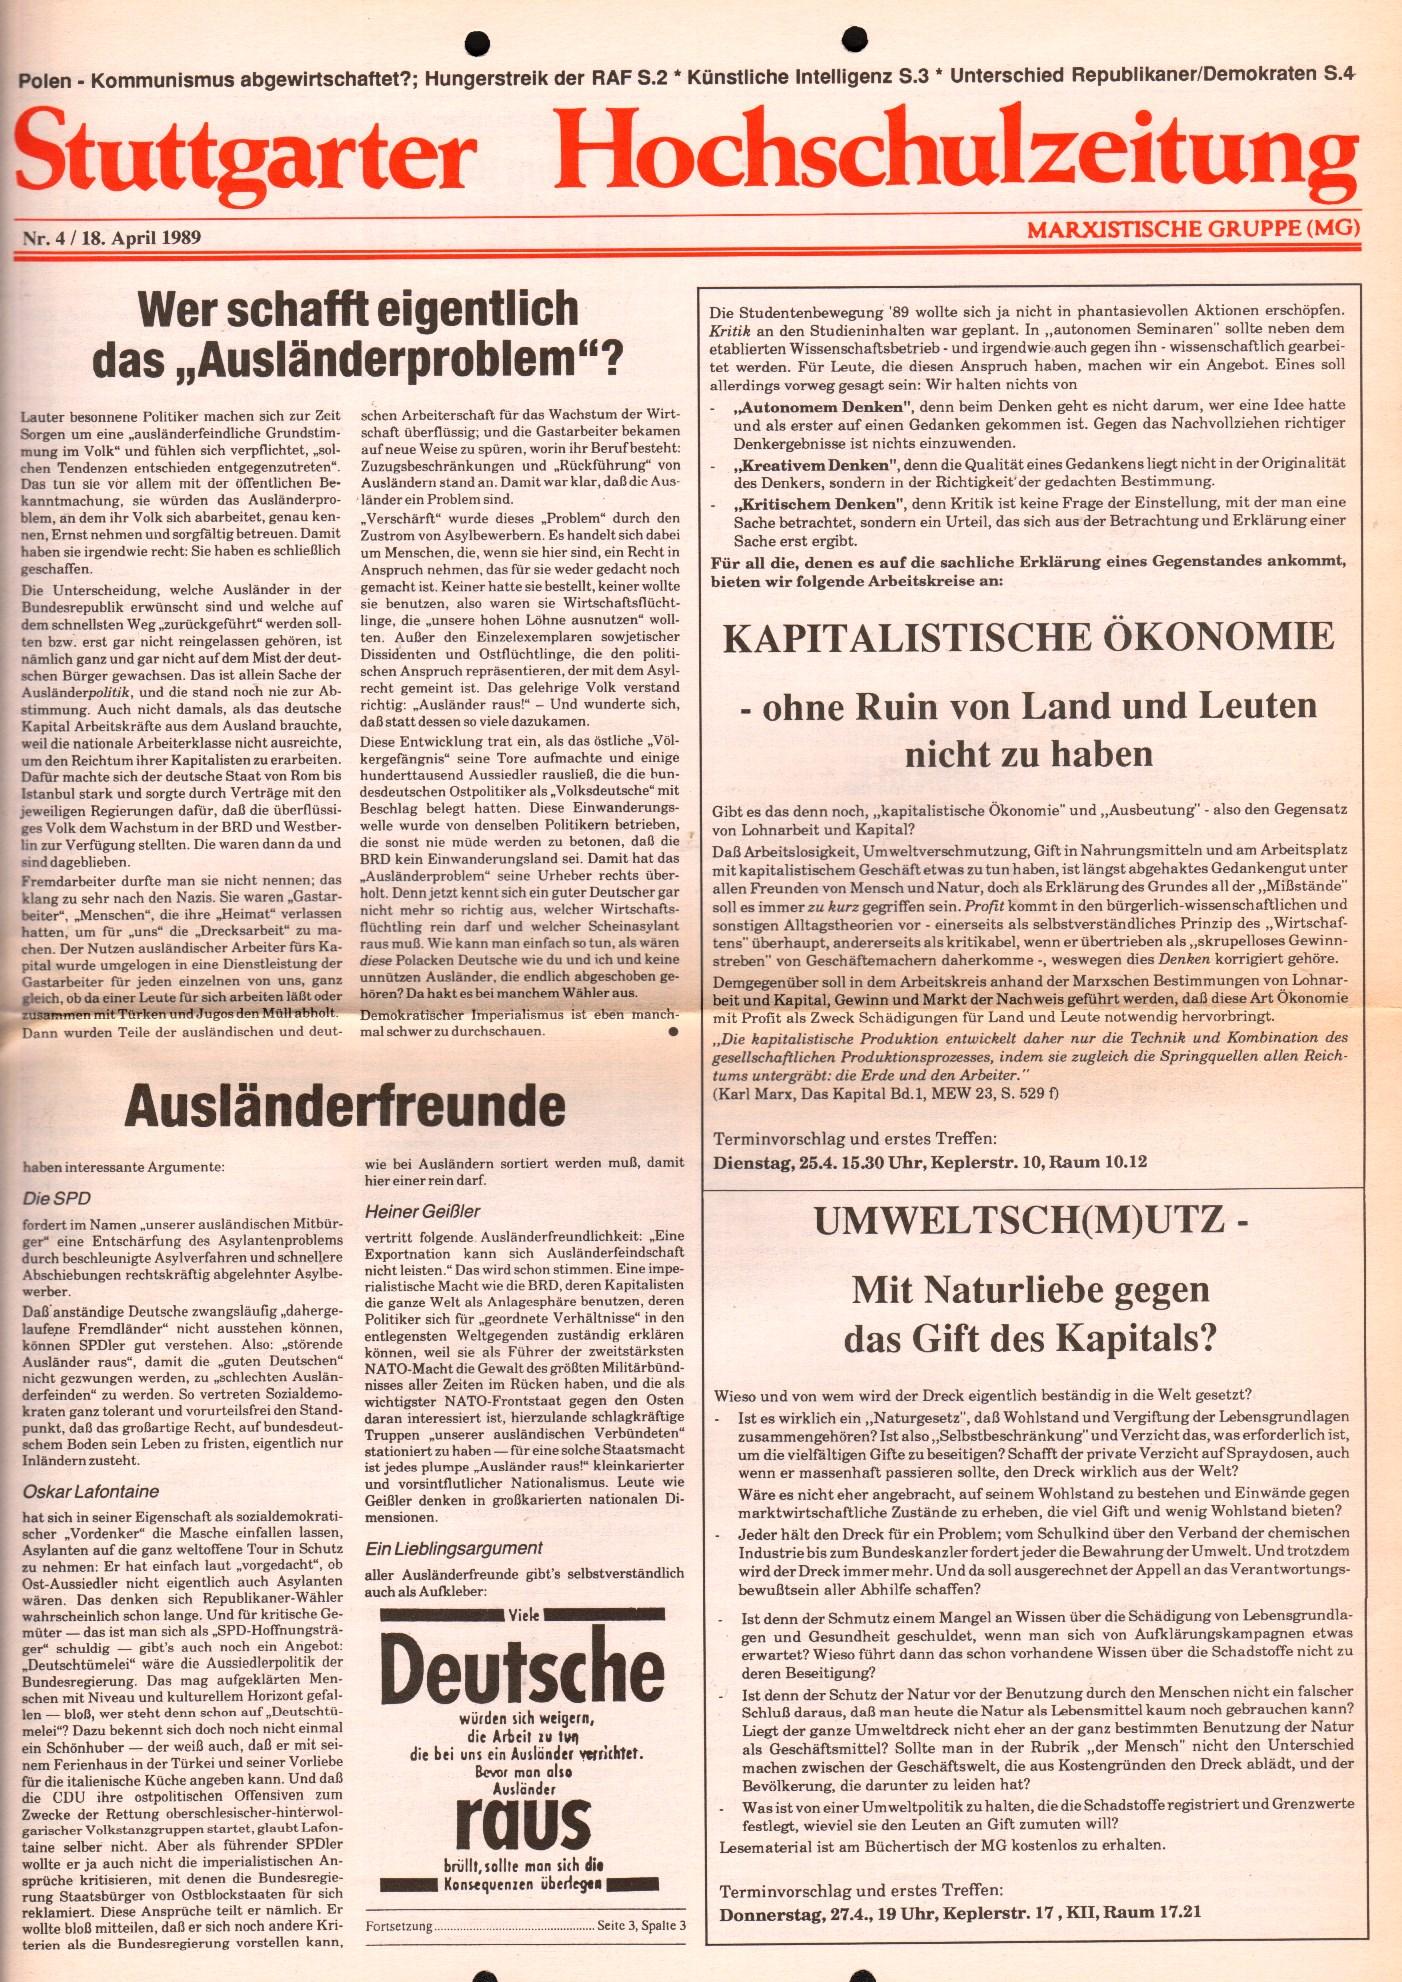 Stuttgart_MG_Hochschulzeitung_1989_04_01